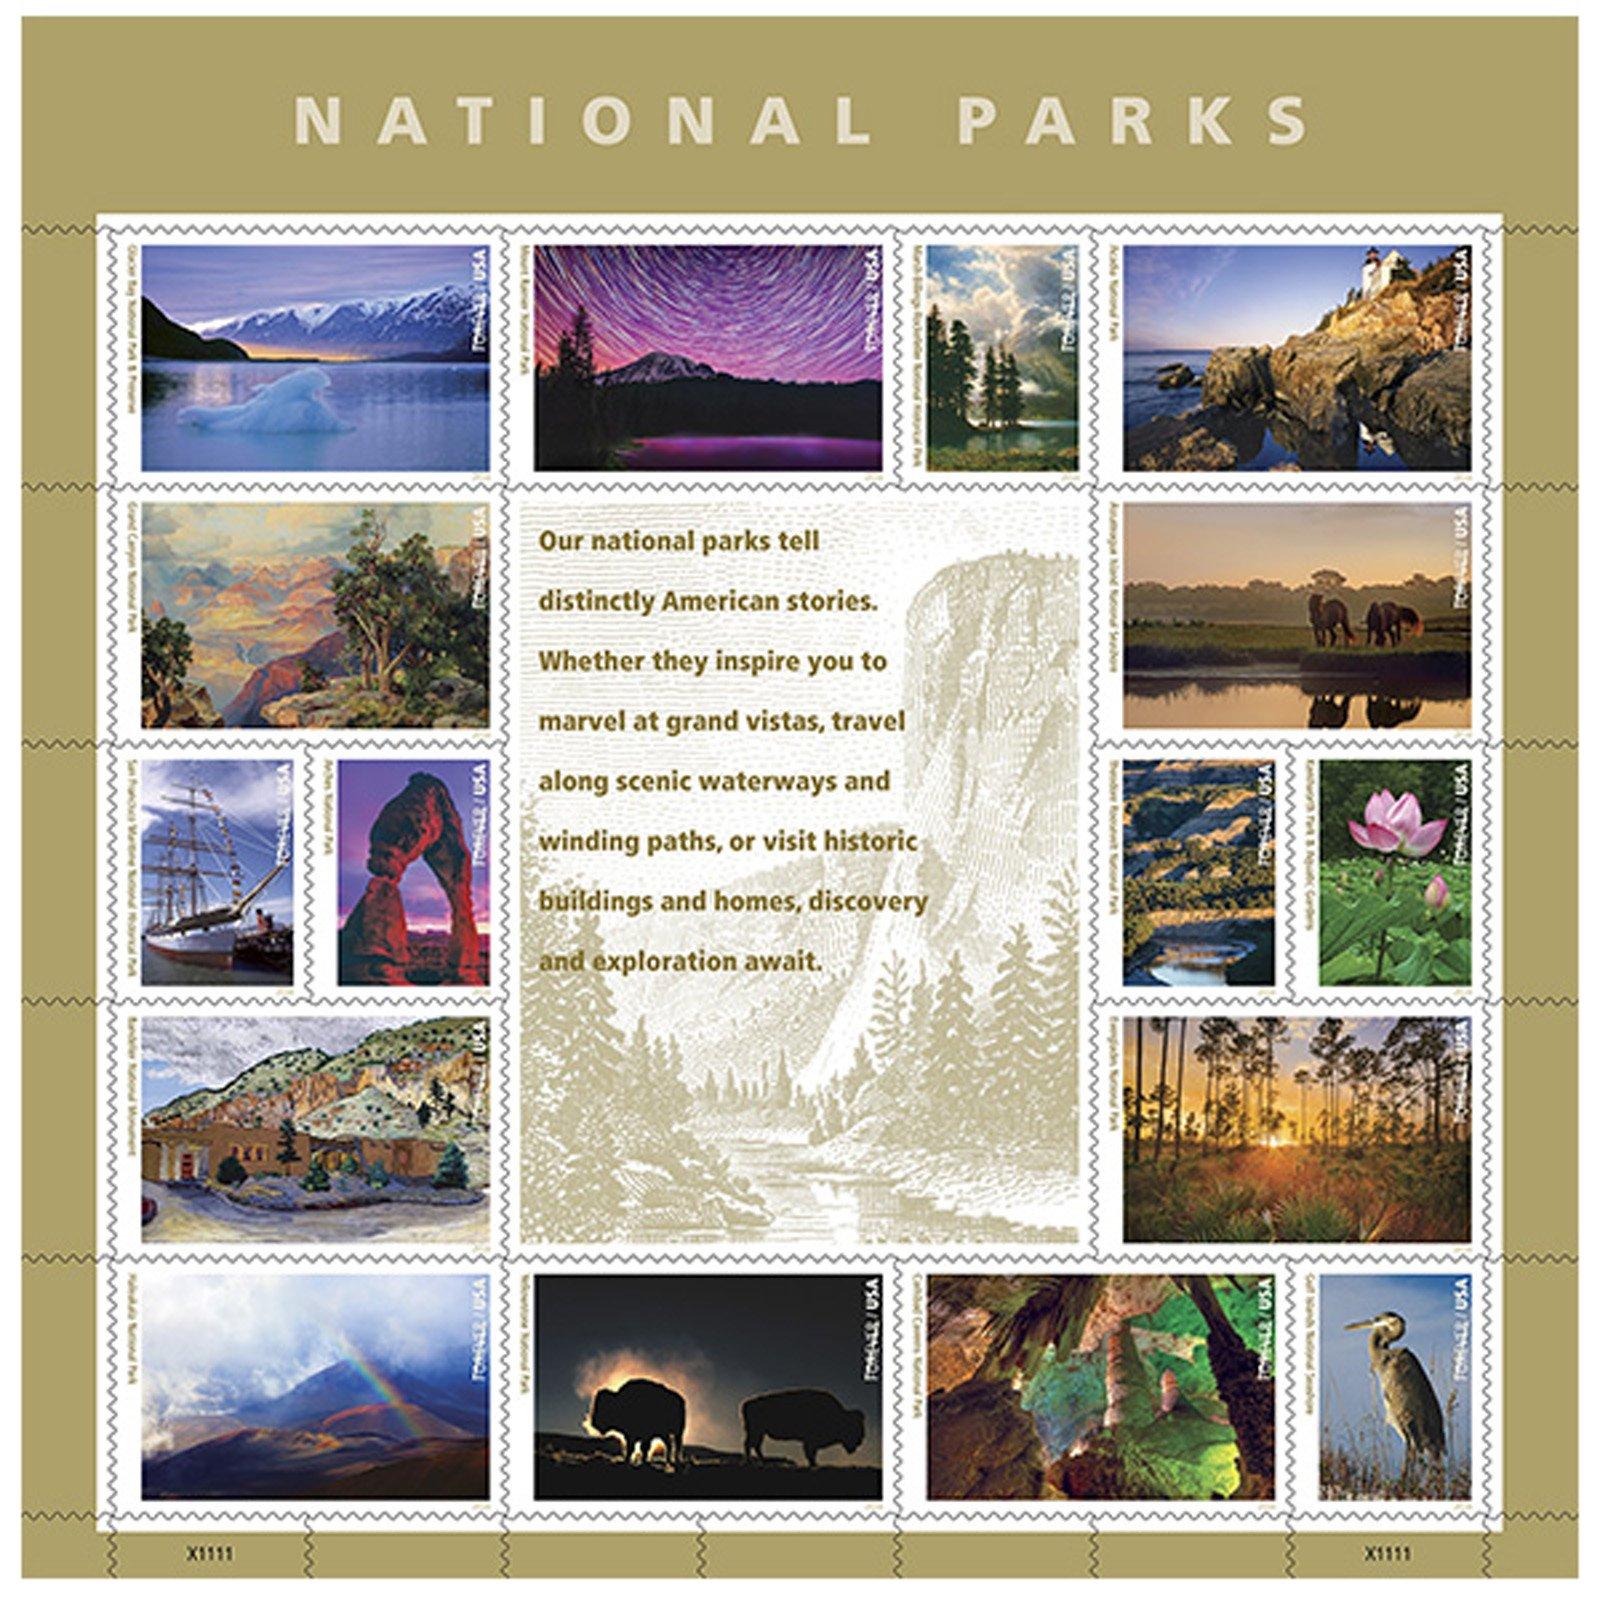 National Parks USPS Forever Stamps Sheet of 16 Postage Stamps 2016 by United States Postal Service Stamps (Image #1)